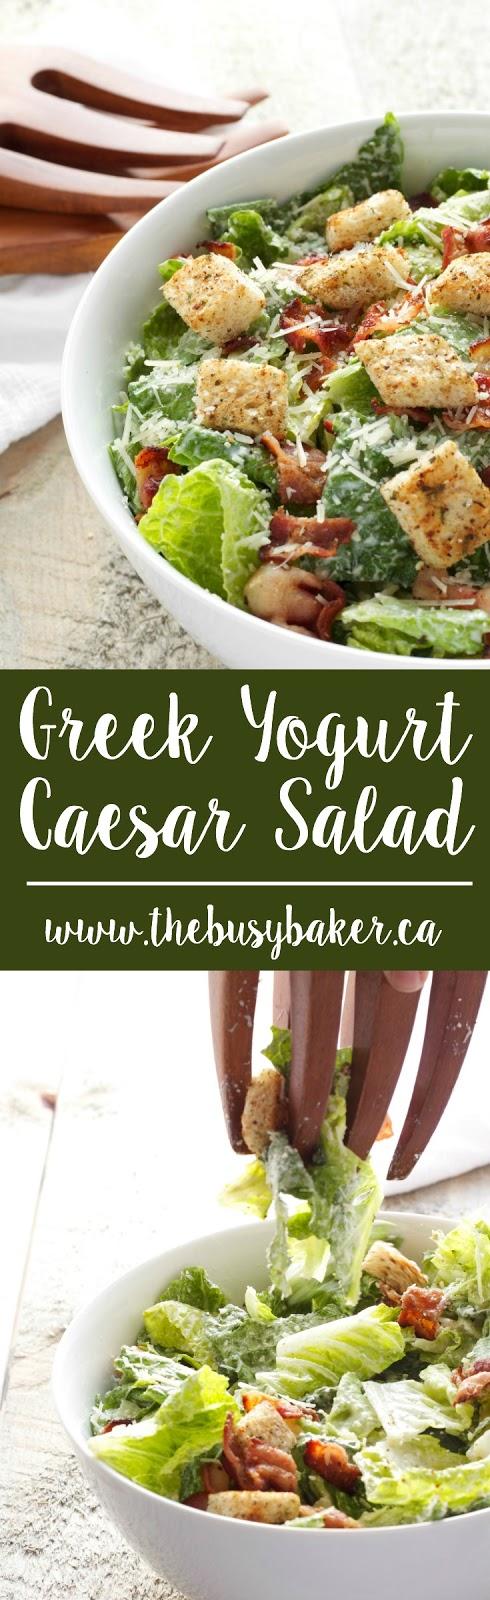 youtube how to make cream yogurt salad dressing